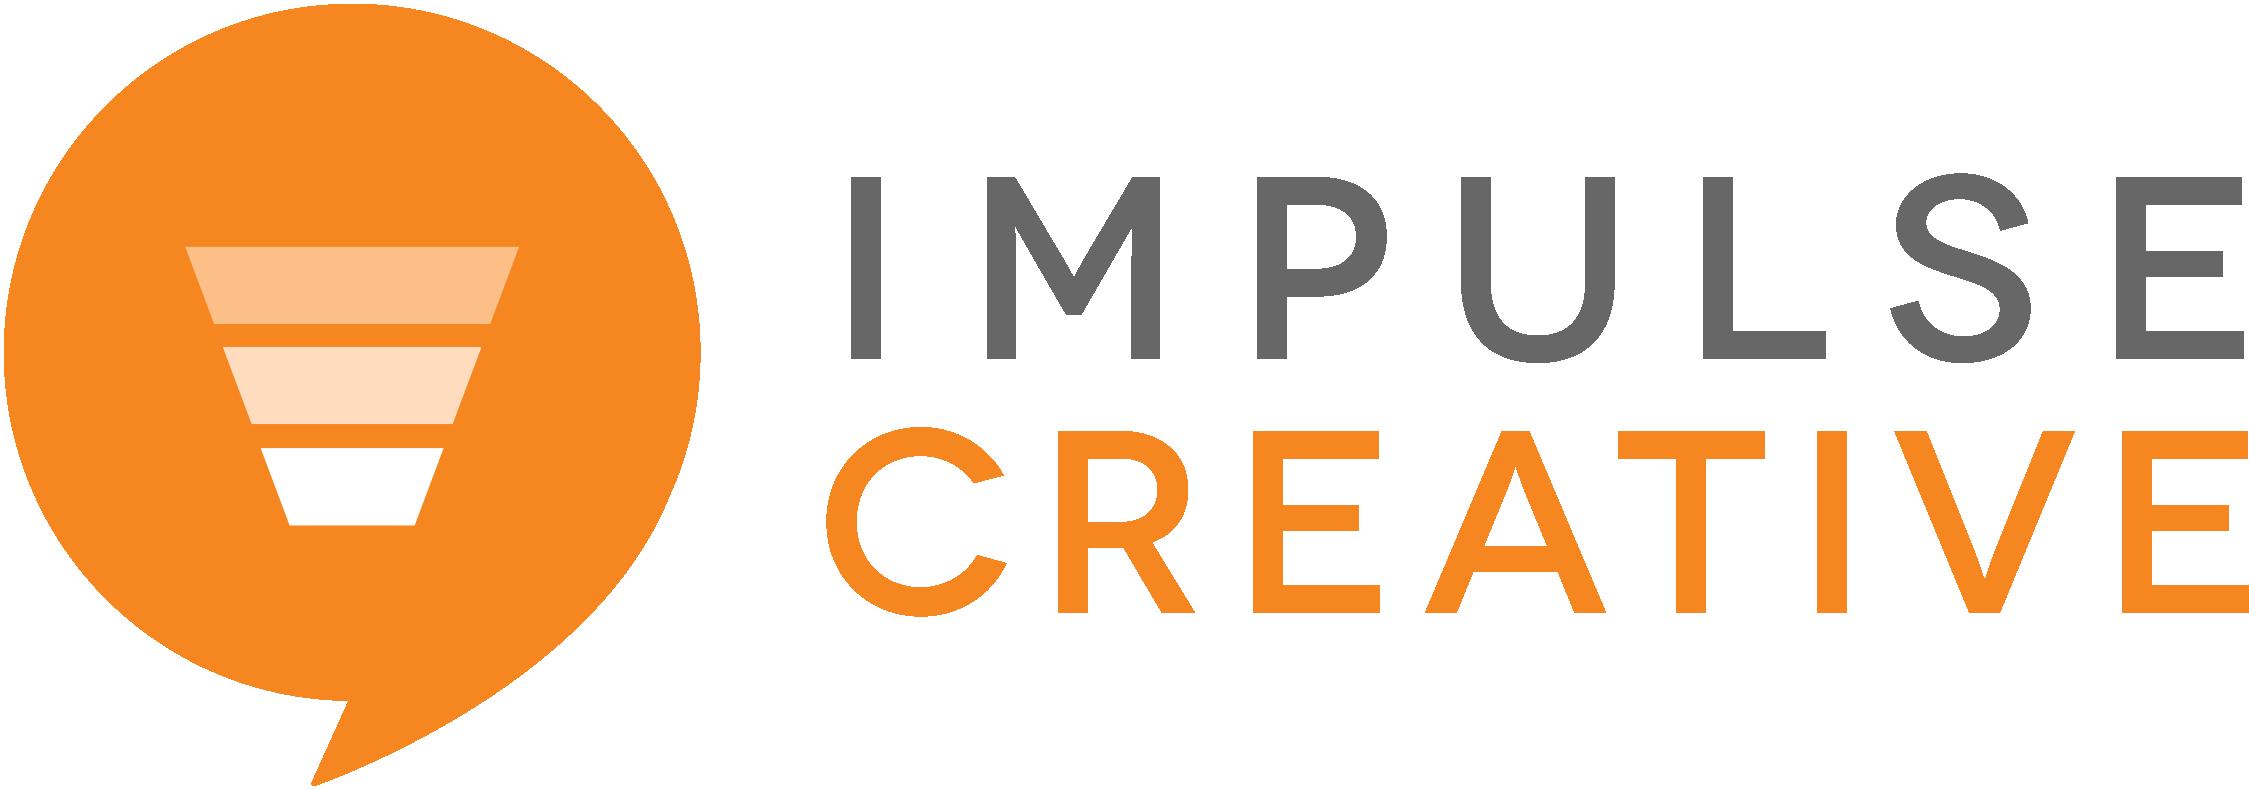 Impulse Creative - Inbound Marketing Agency